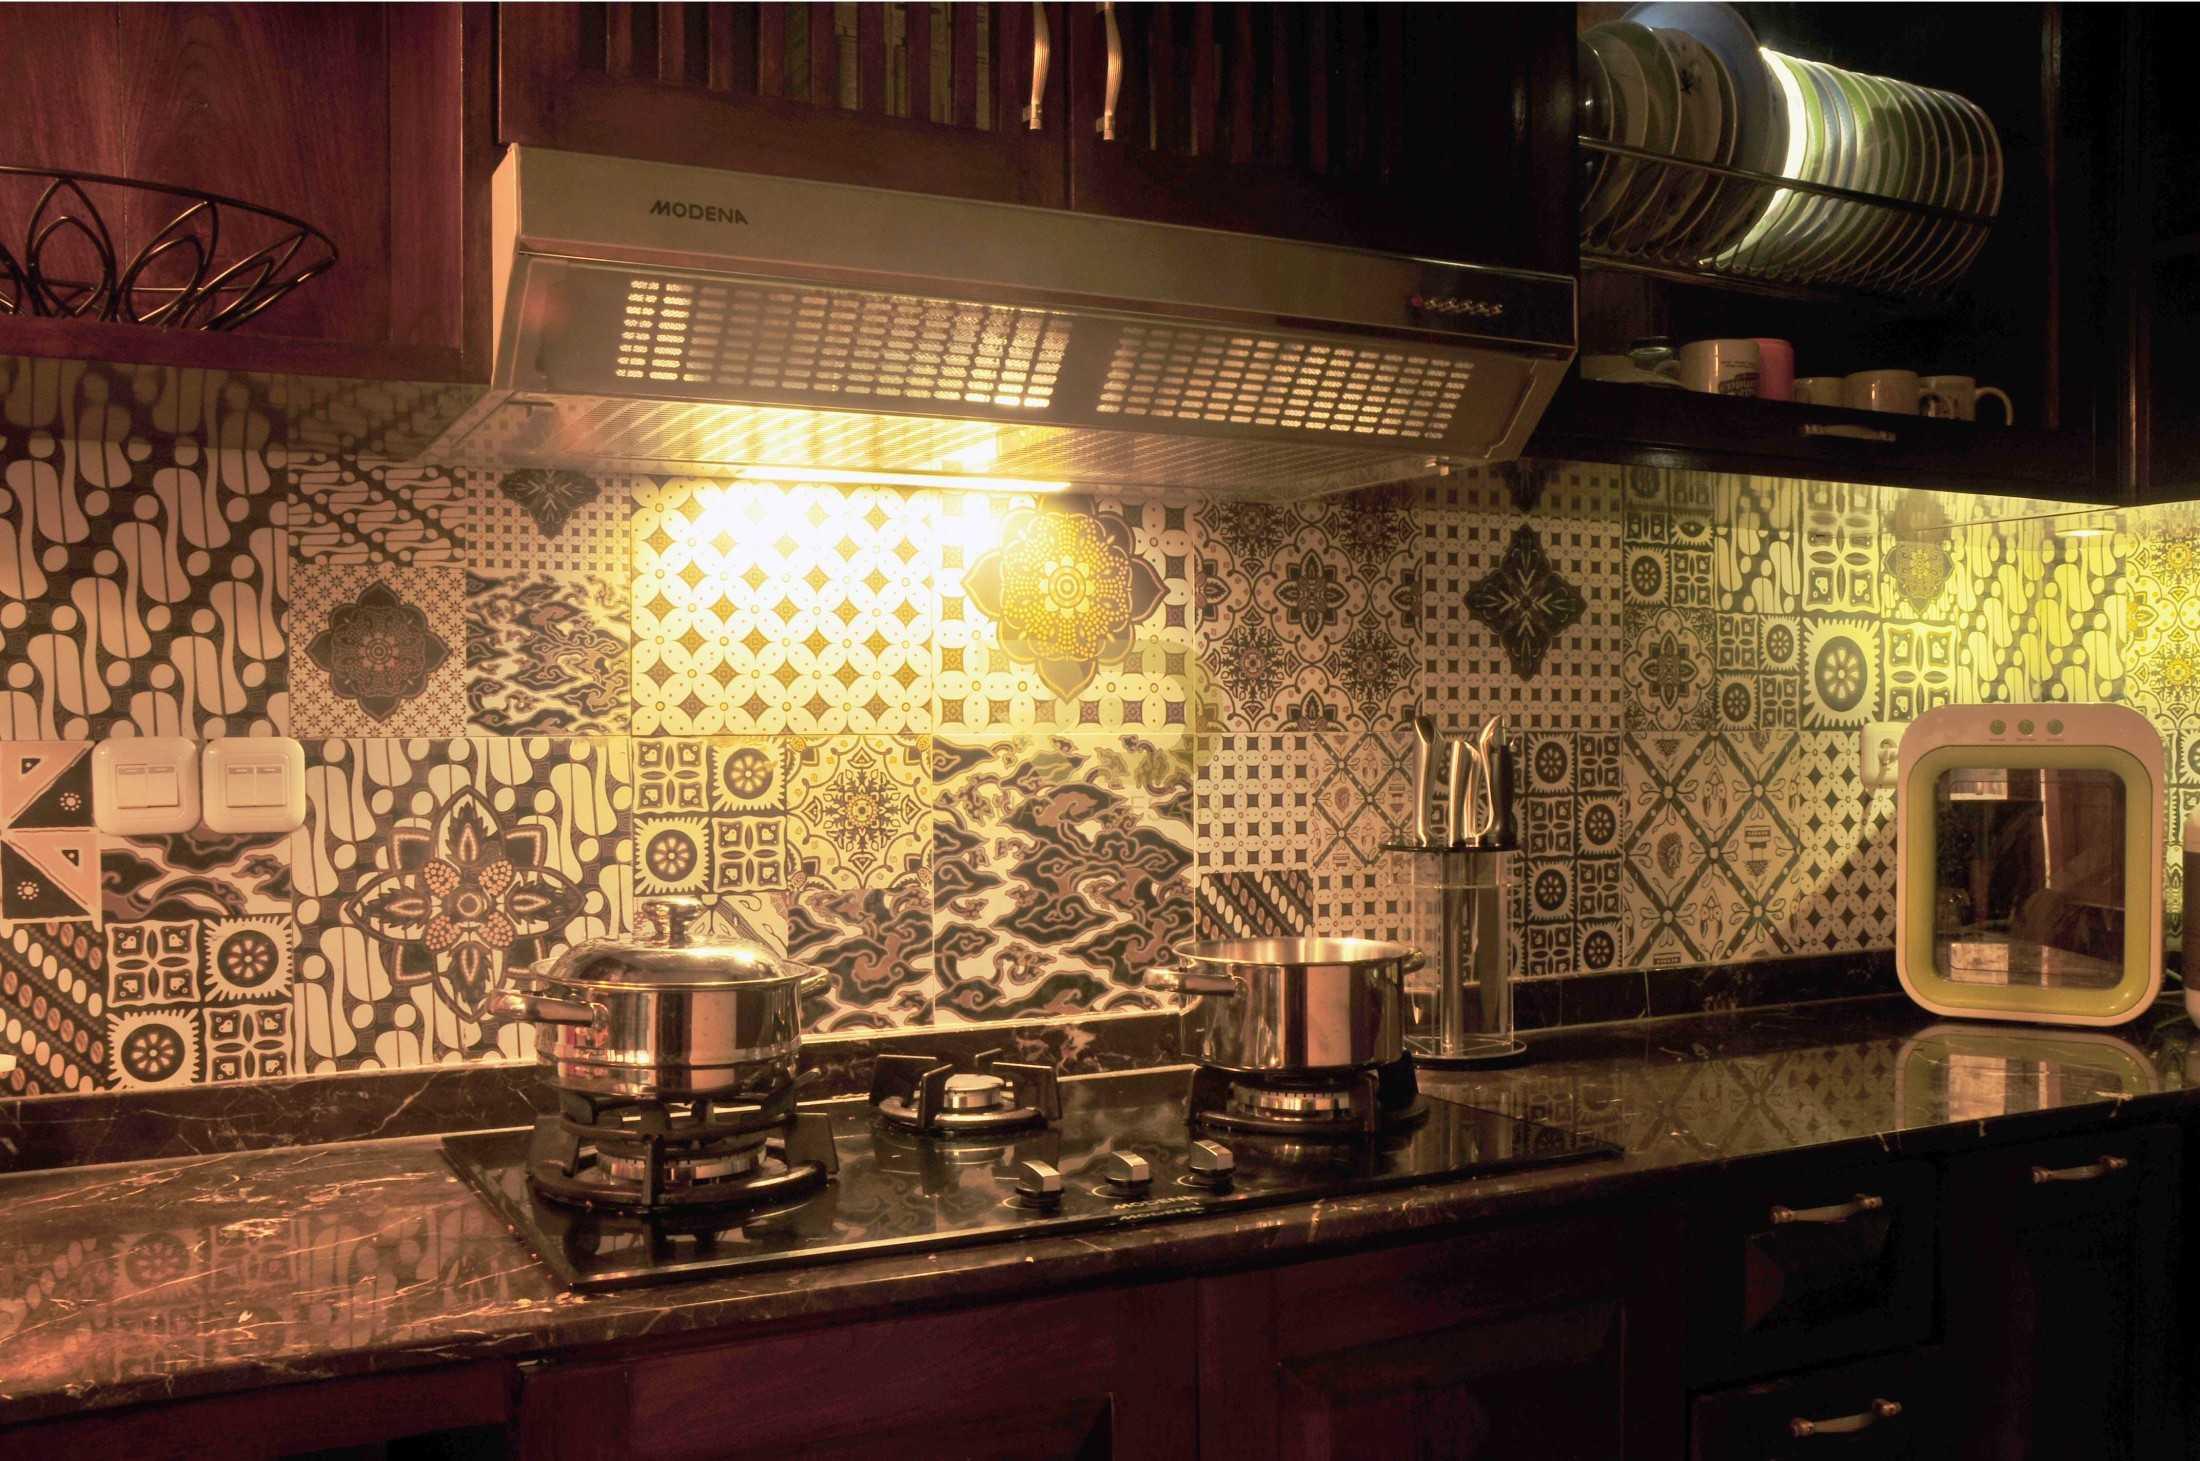 Ruang Desain Solid Wood Kitchen Surabaya, Kota Sby, Jawa Timur, Indonesia Surabaya, Kota Sby, Jawa Timur, Indonesia Ruang-Desain-Solid-Wood-Kitchen  93958